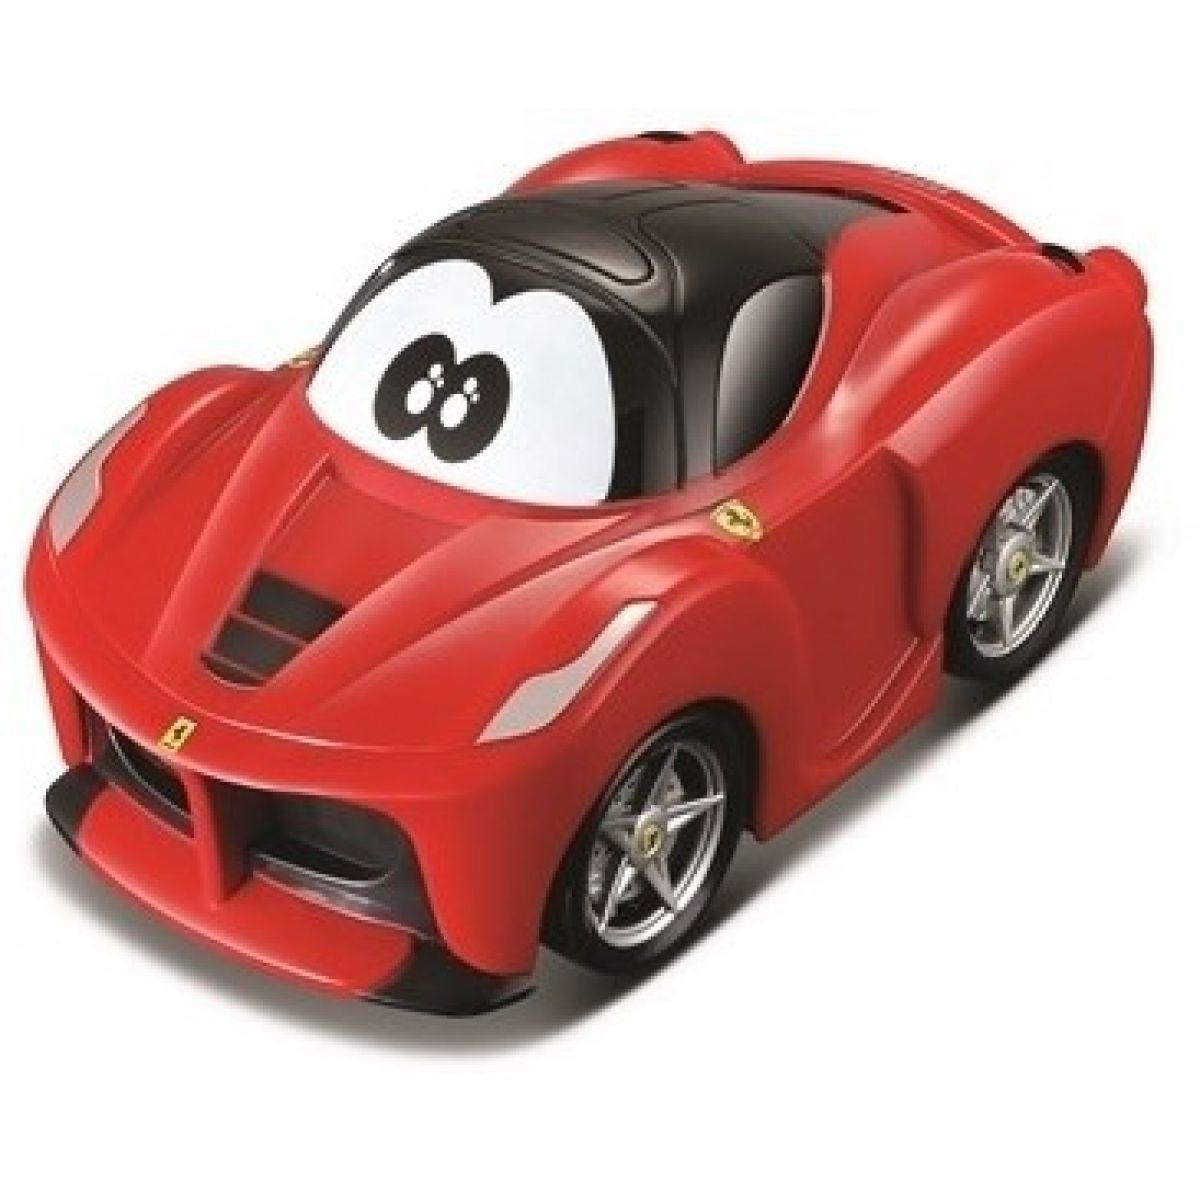 Bburago Ferrari plastové autíčko červené